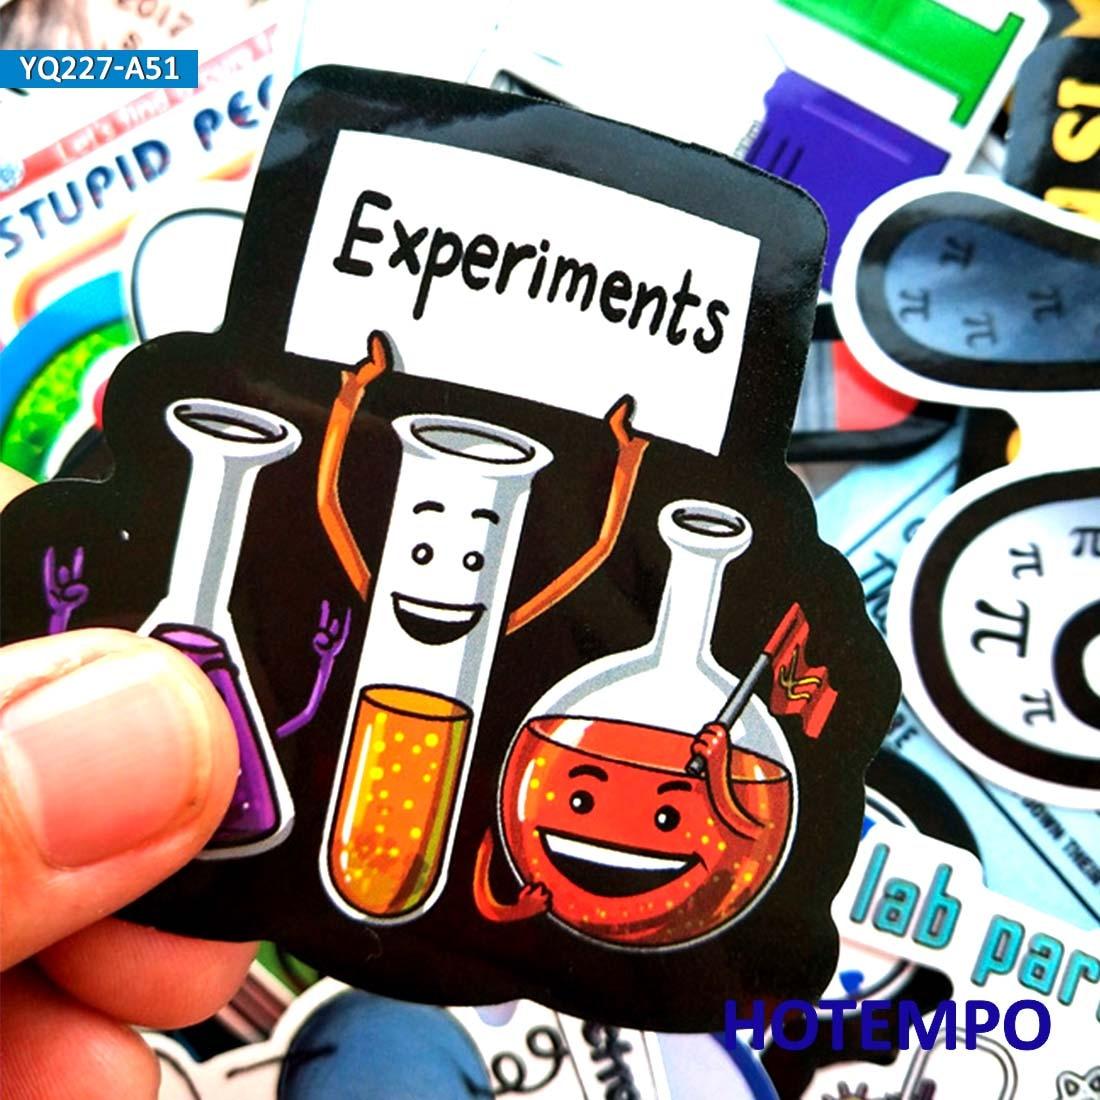 50pcs Science Laboratory Chemical Math Symbol Element Formula Mixed Style Stickers For Phone Laptop Luggage Suitcase Skateboard